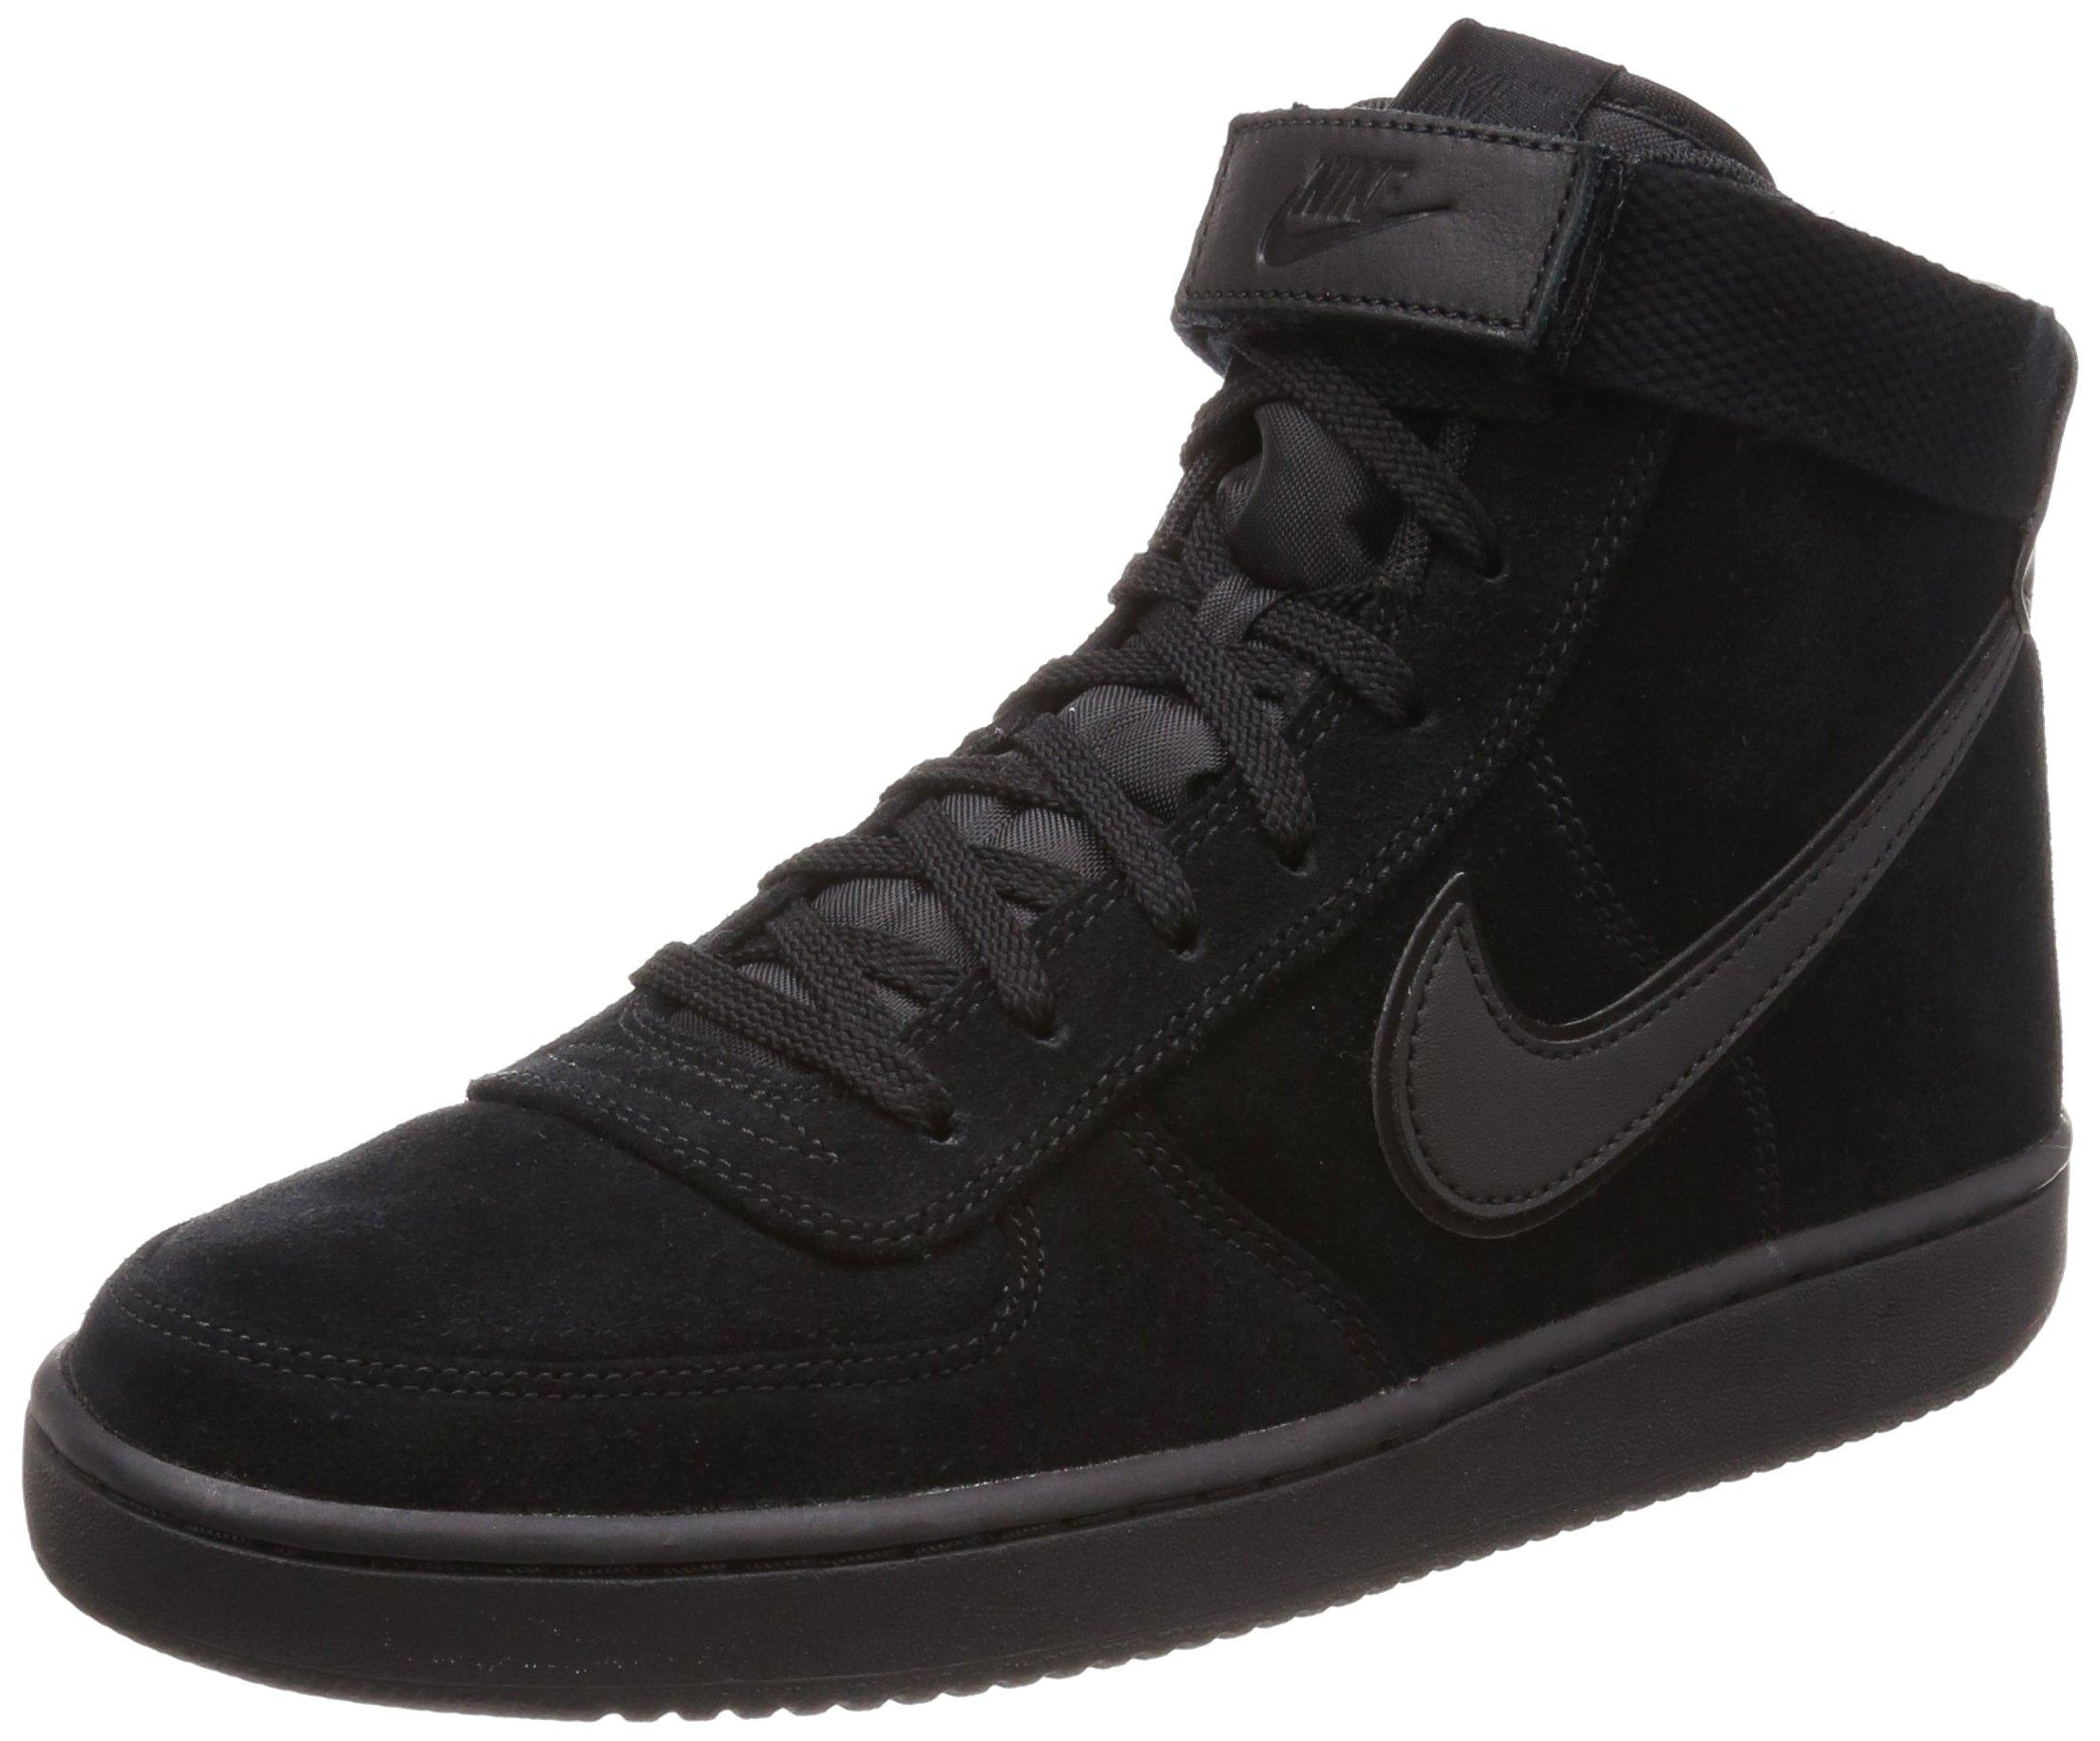 new product 69eb4 00abb Nike Vandal High Supreme LTR Mens Hi Top Trainers AH8518 Sneakers Shoes (UK  7 US